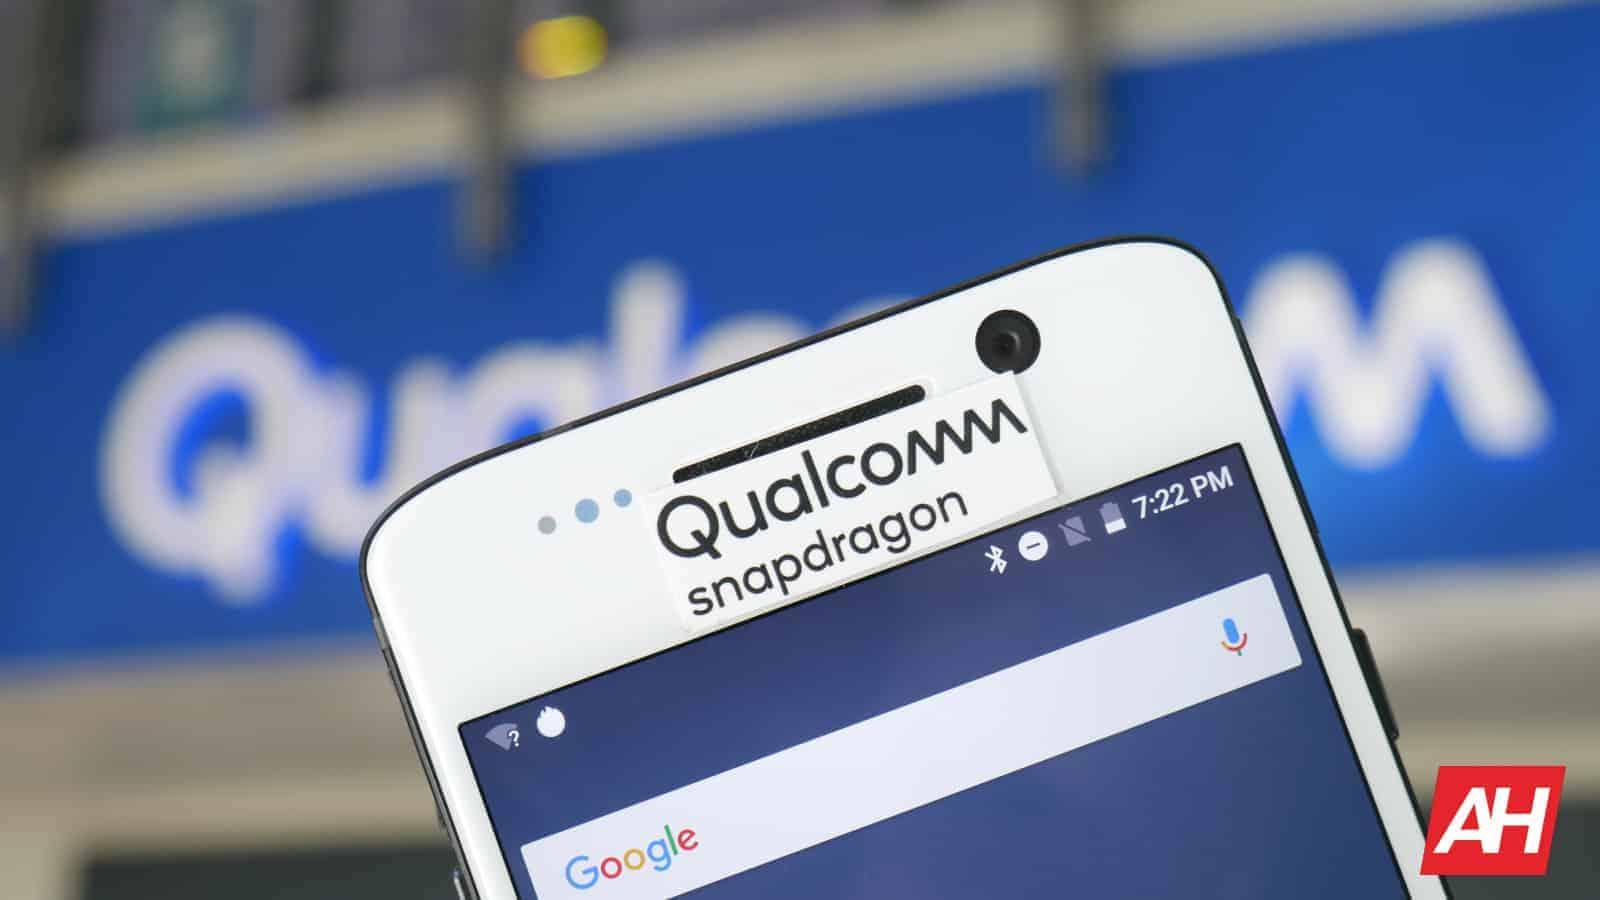 Qualcomm Snapdragon AH 6